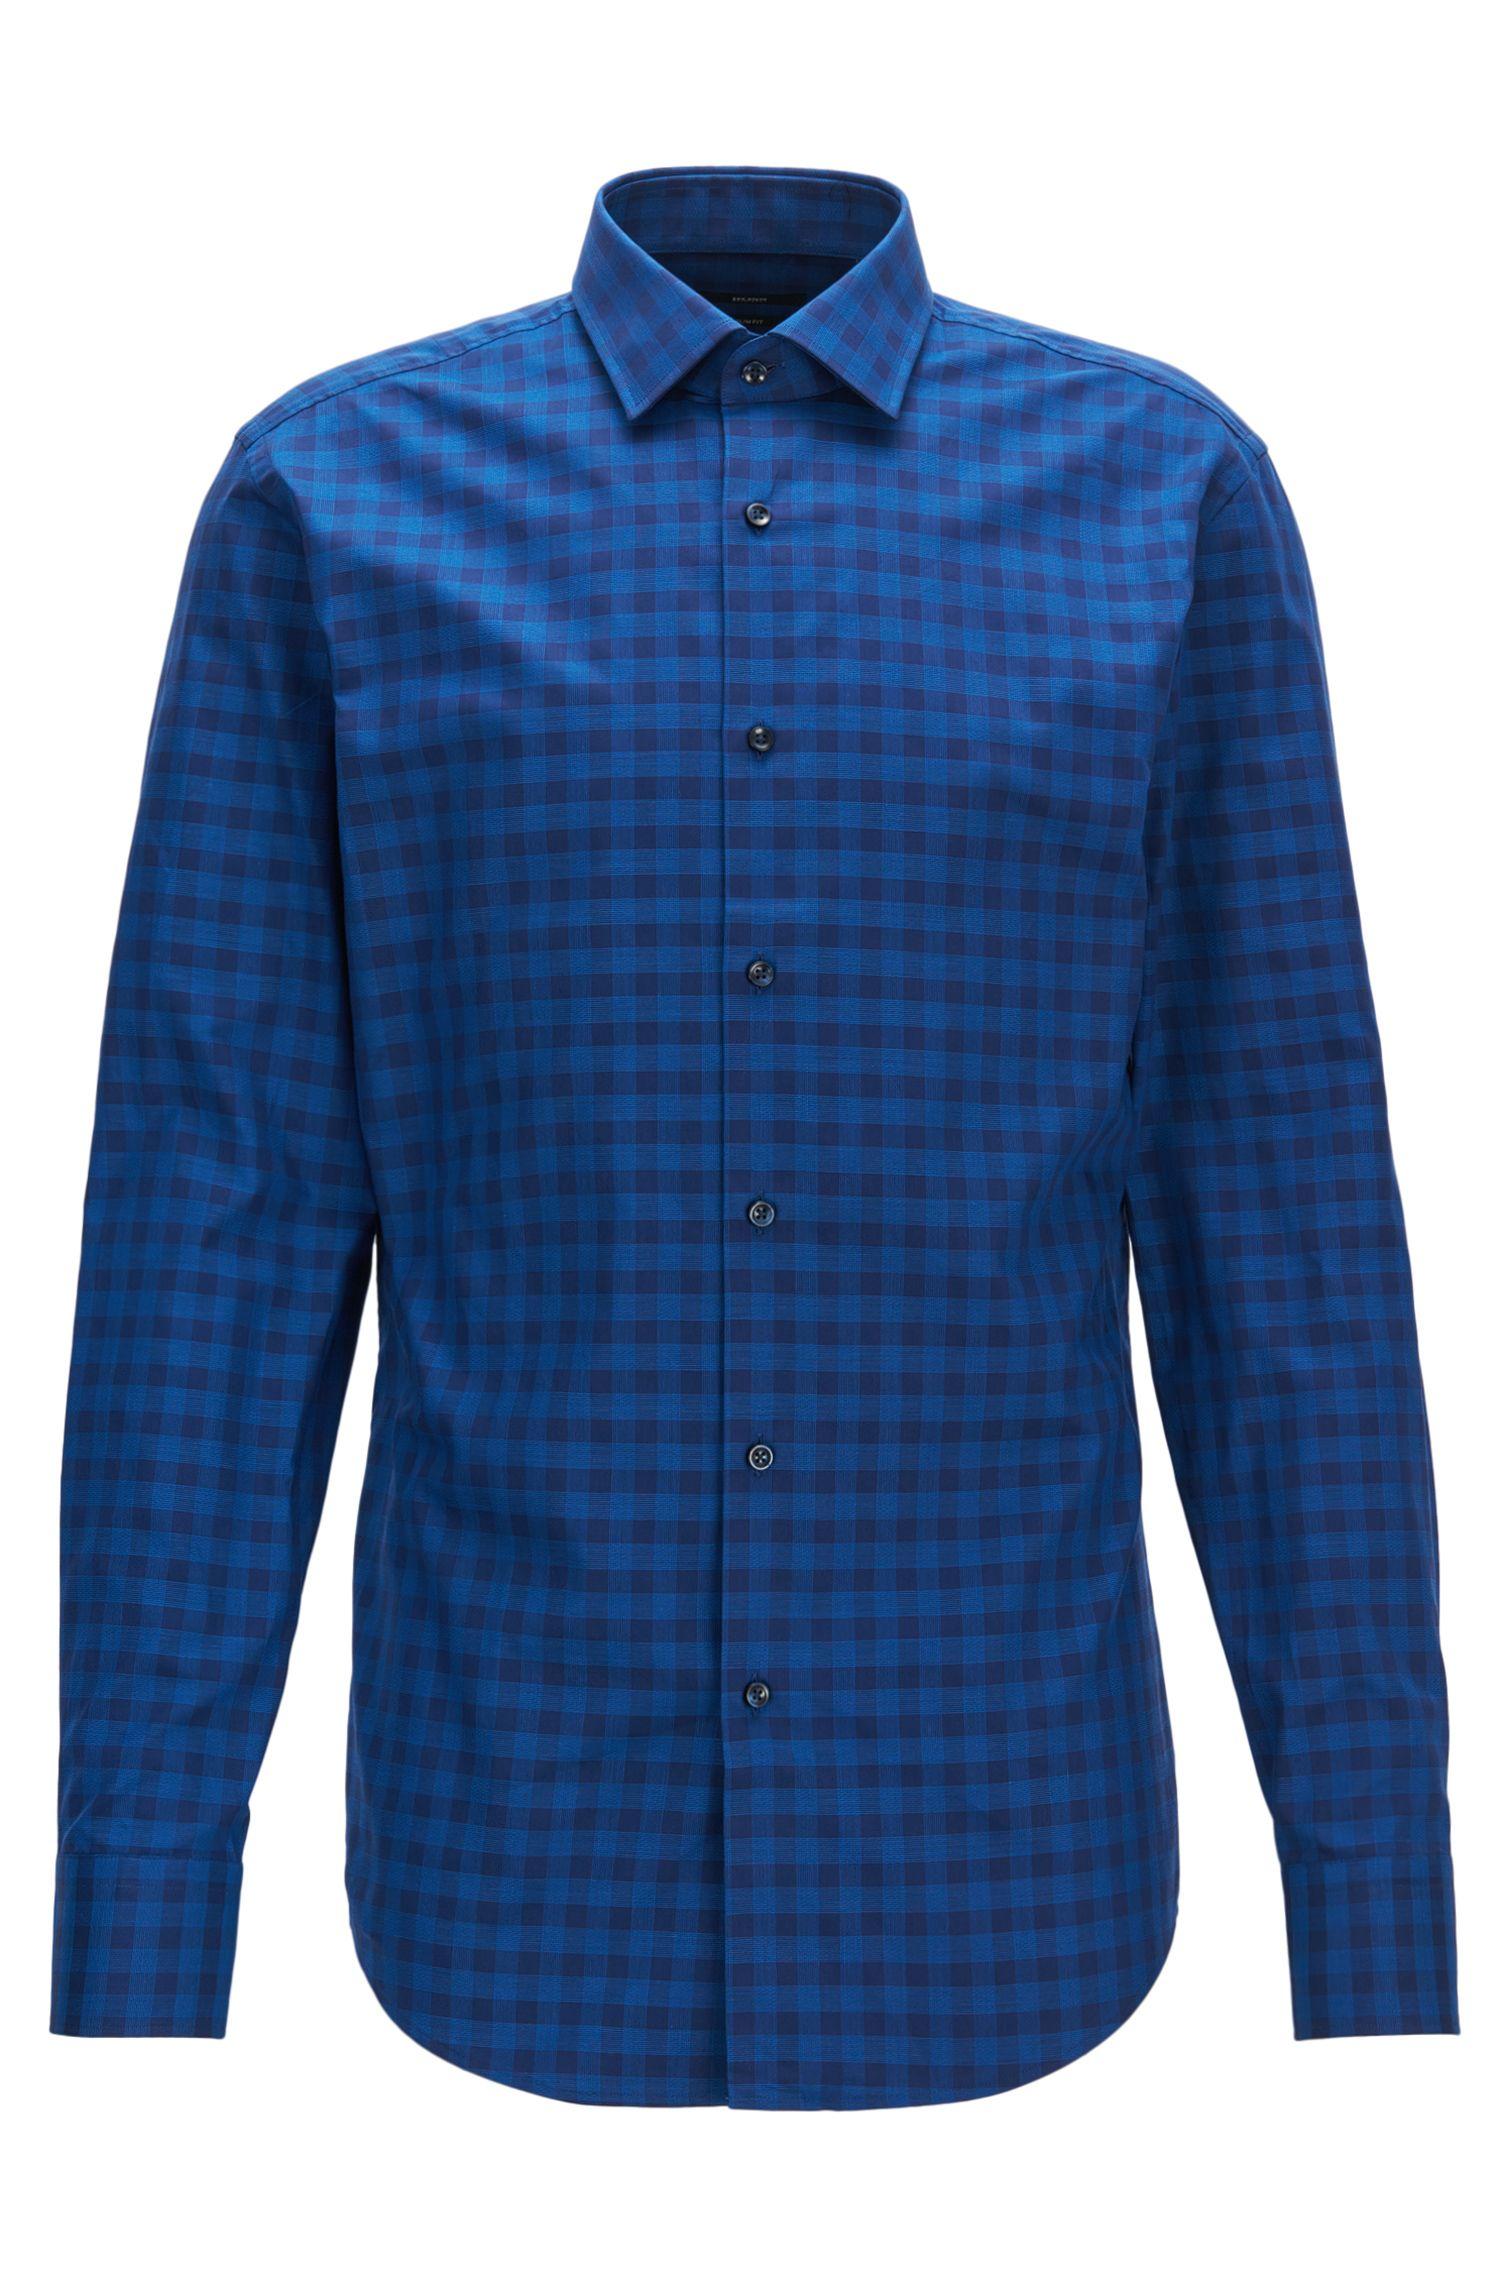 Gingham Cotton Dress Shirt, Slim Fit   Jenno